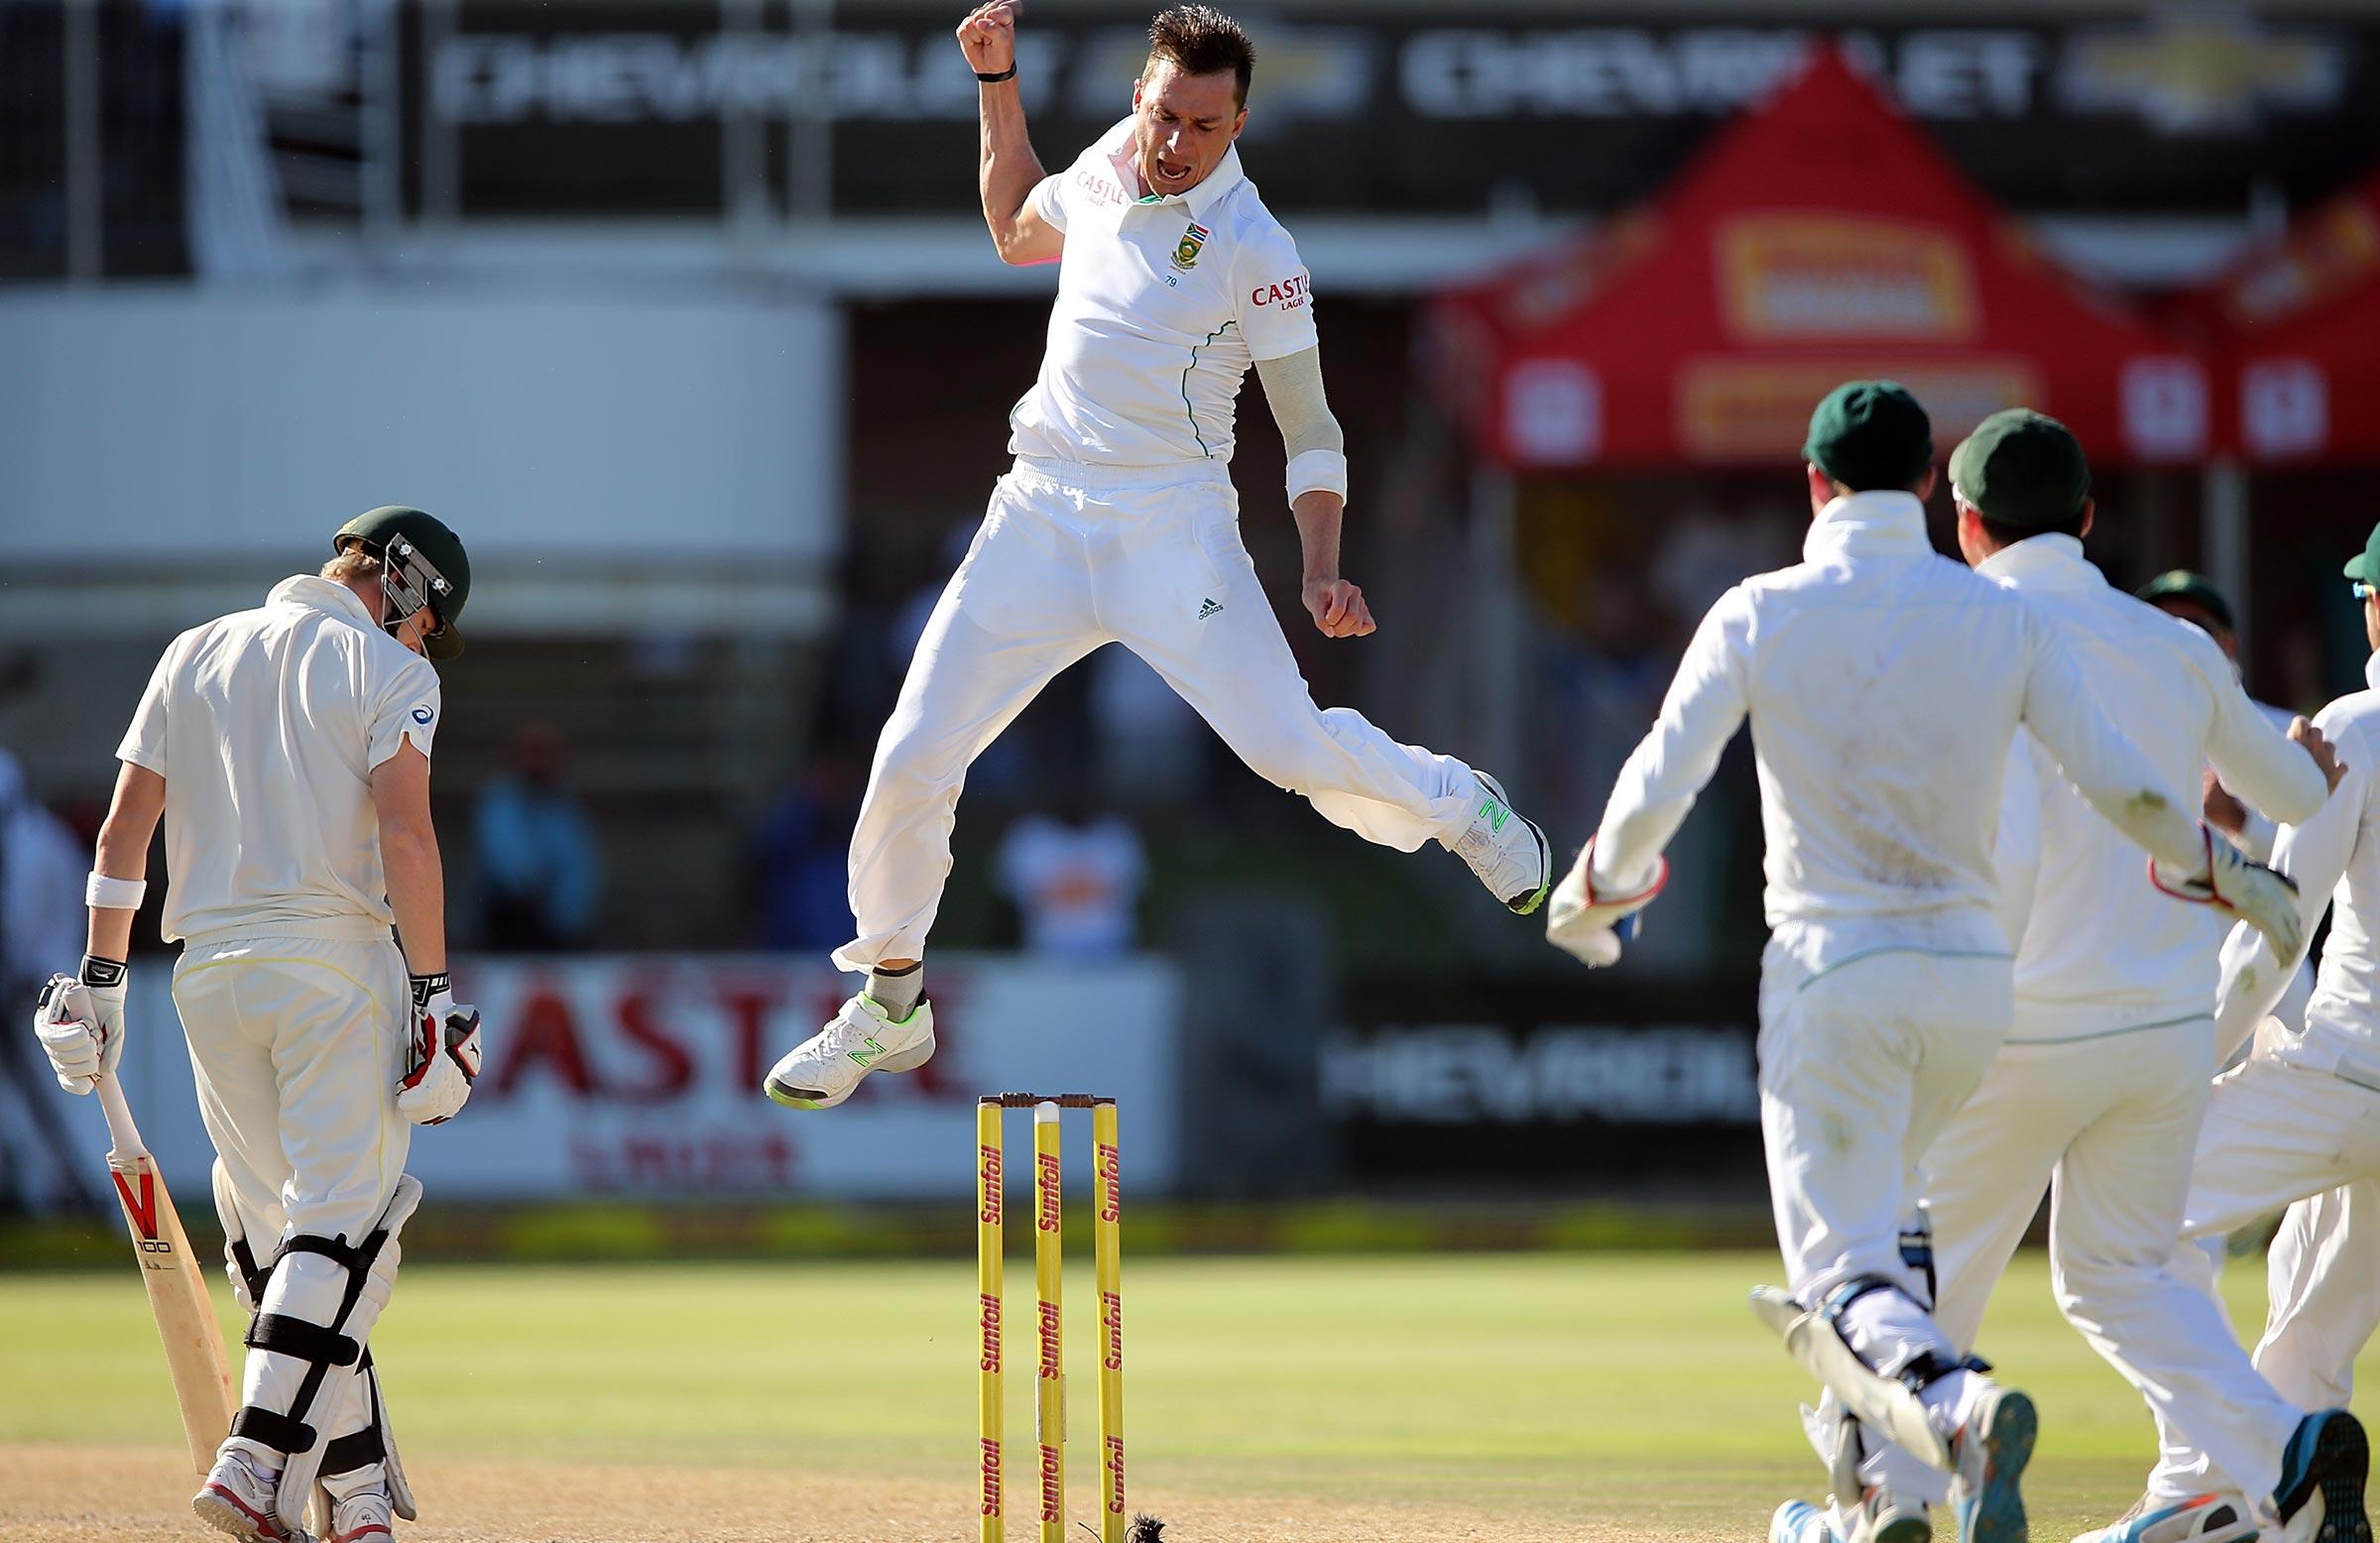 Steyn celebrates Smith's wicket at Port Elizabeth in 2014 // Getty